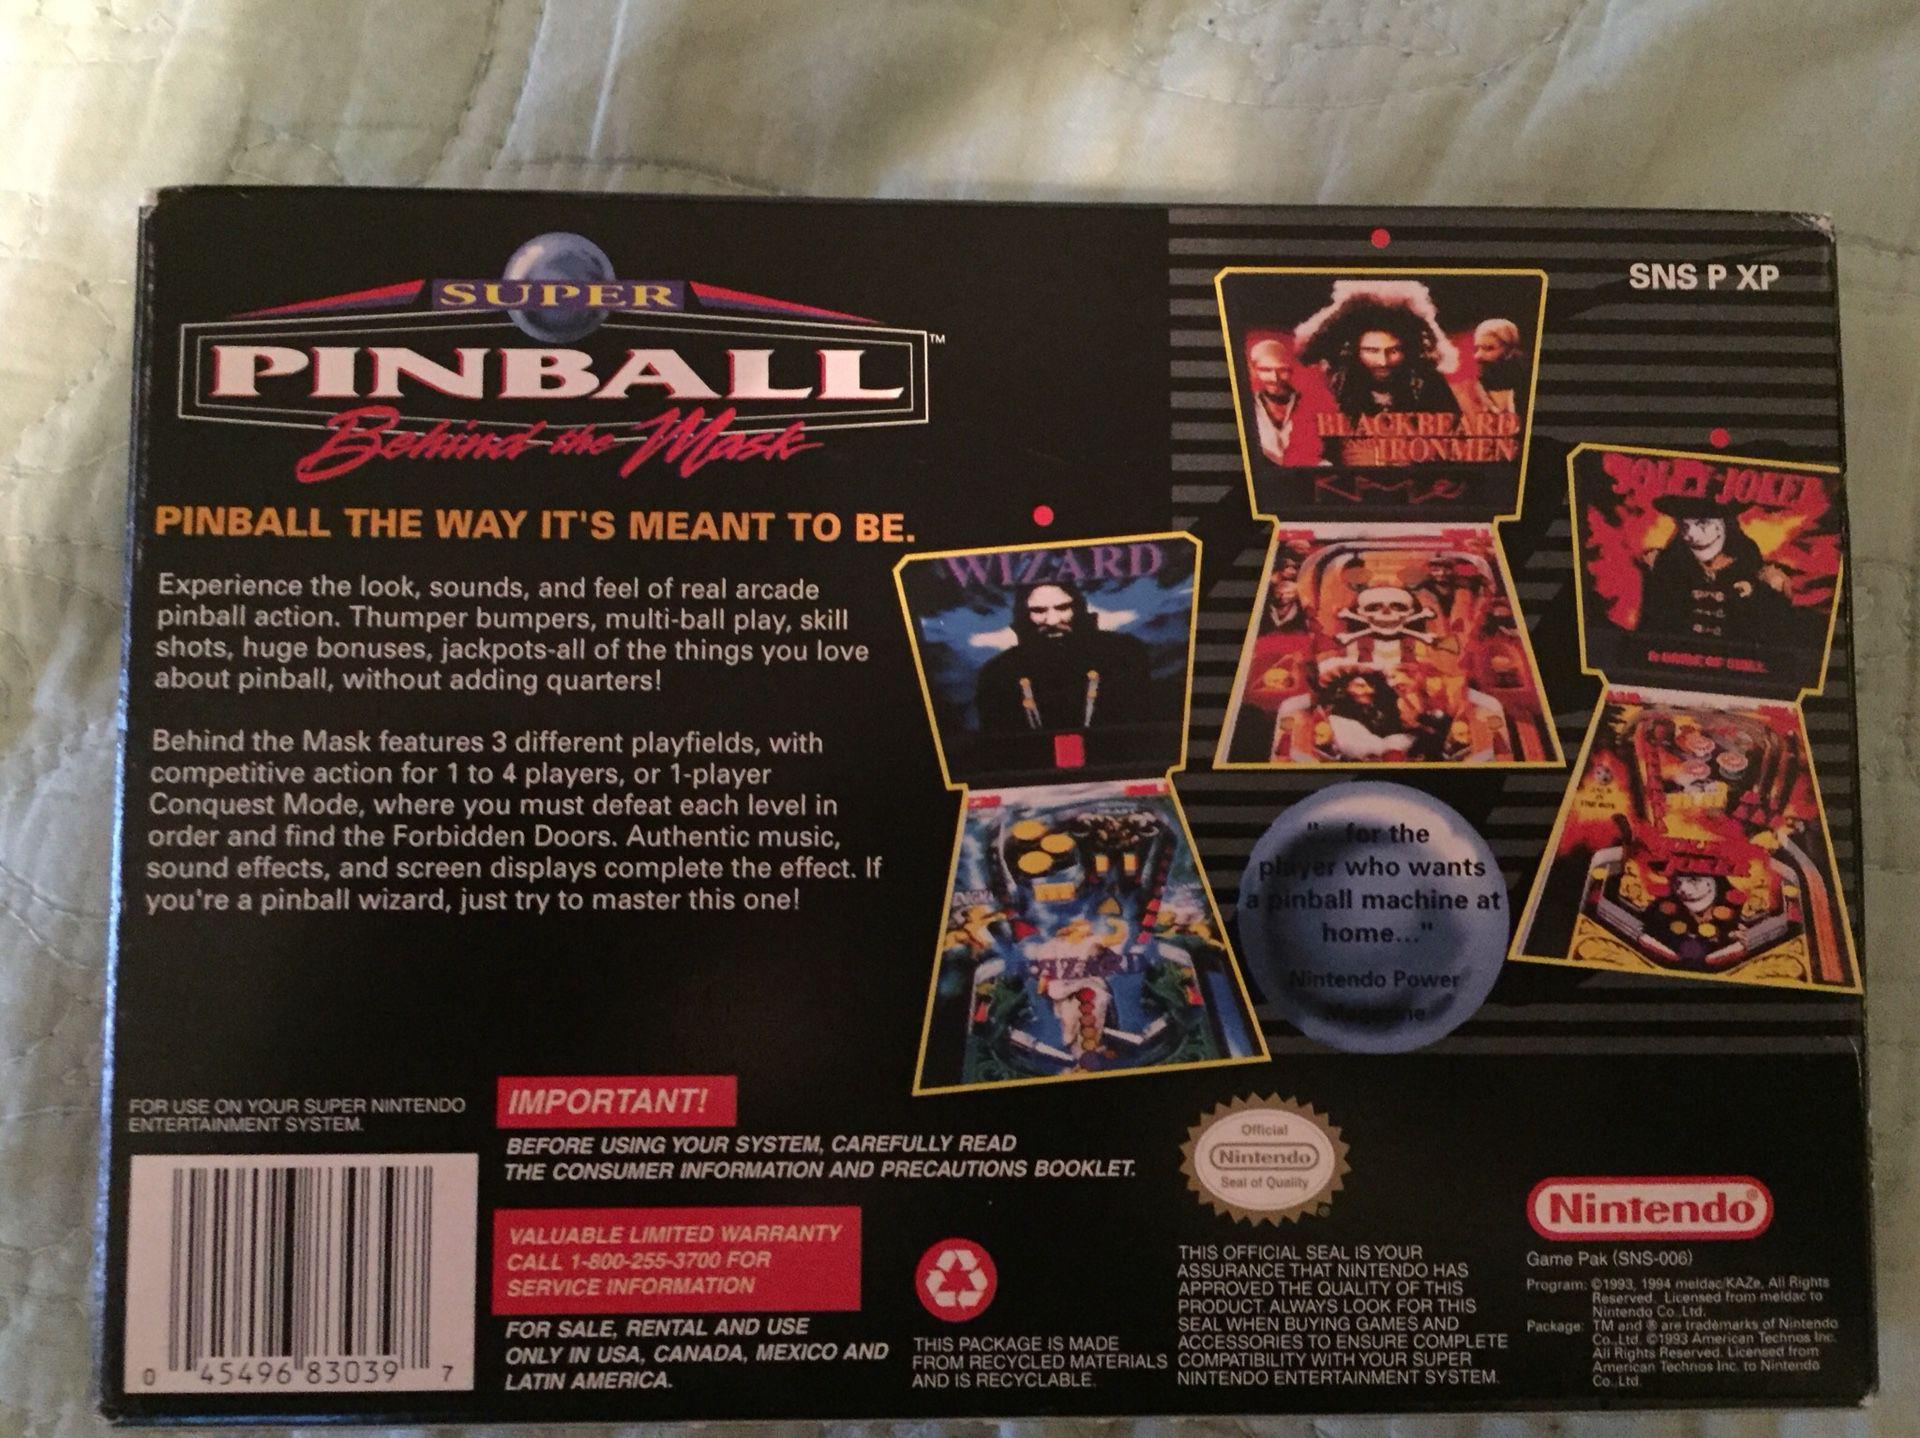 SNES Super Pinball Behind the Mask CIB